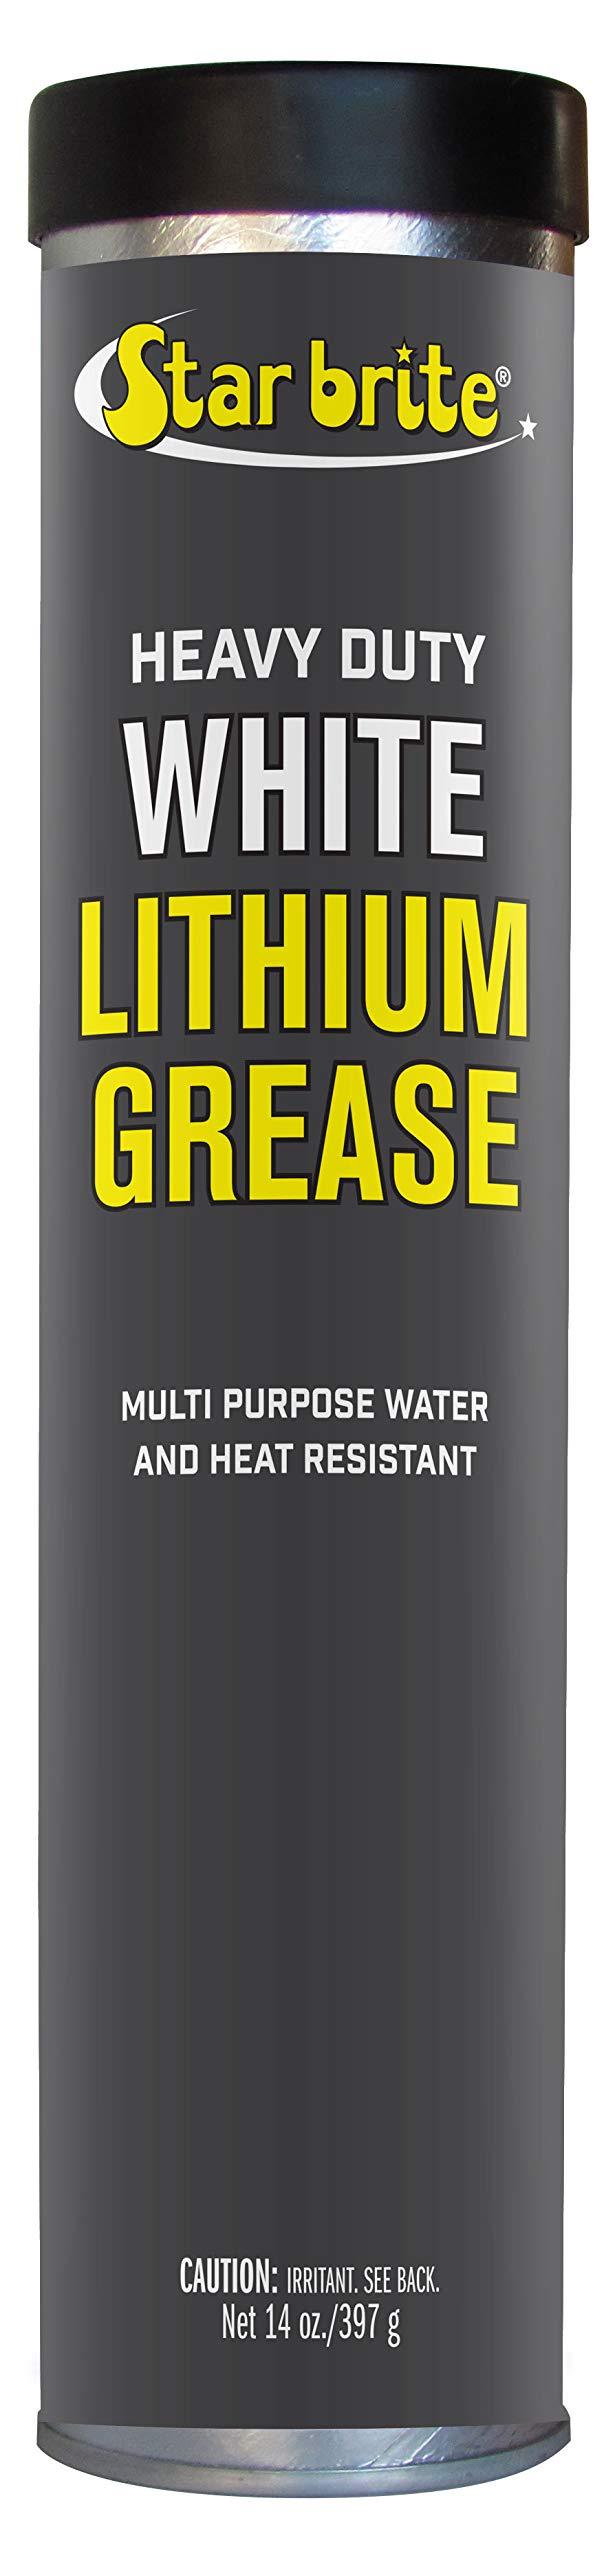 Star Brite White Lithium Grease Cartridge (14-Ounce)